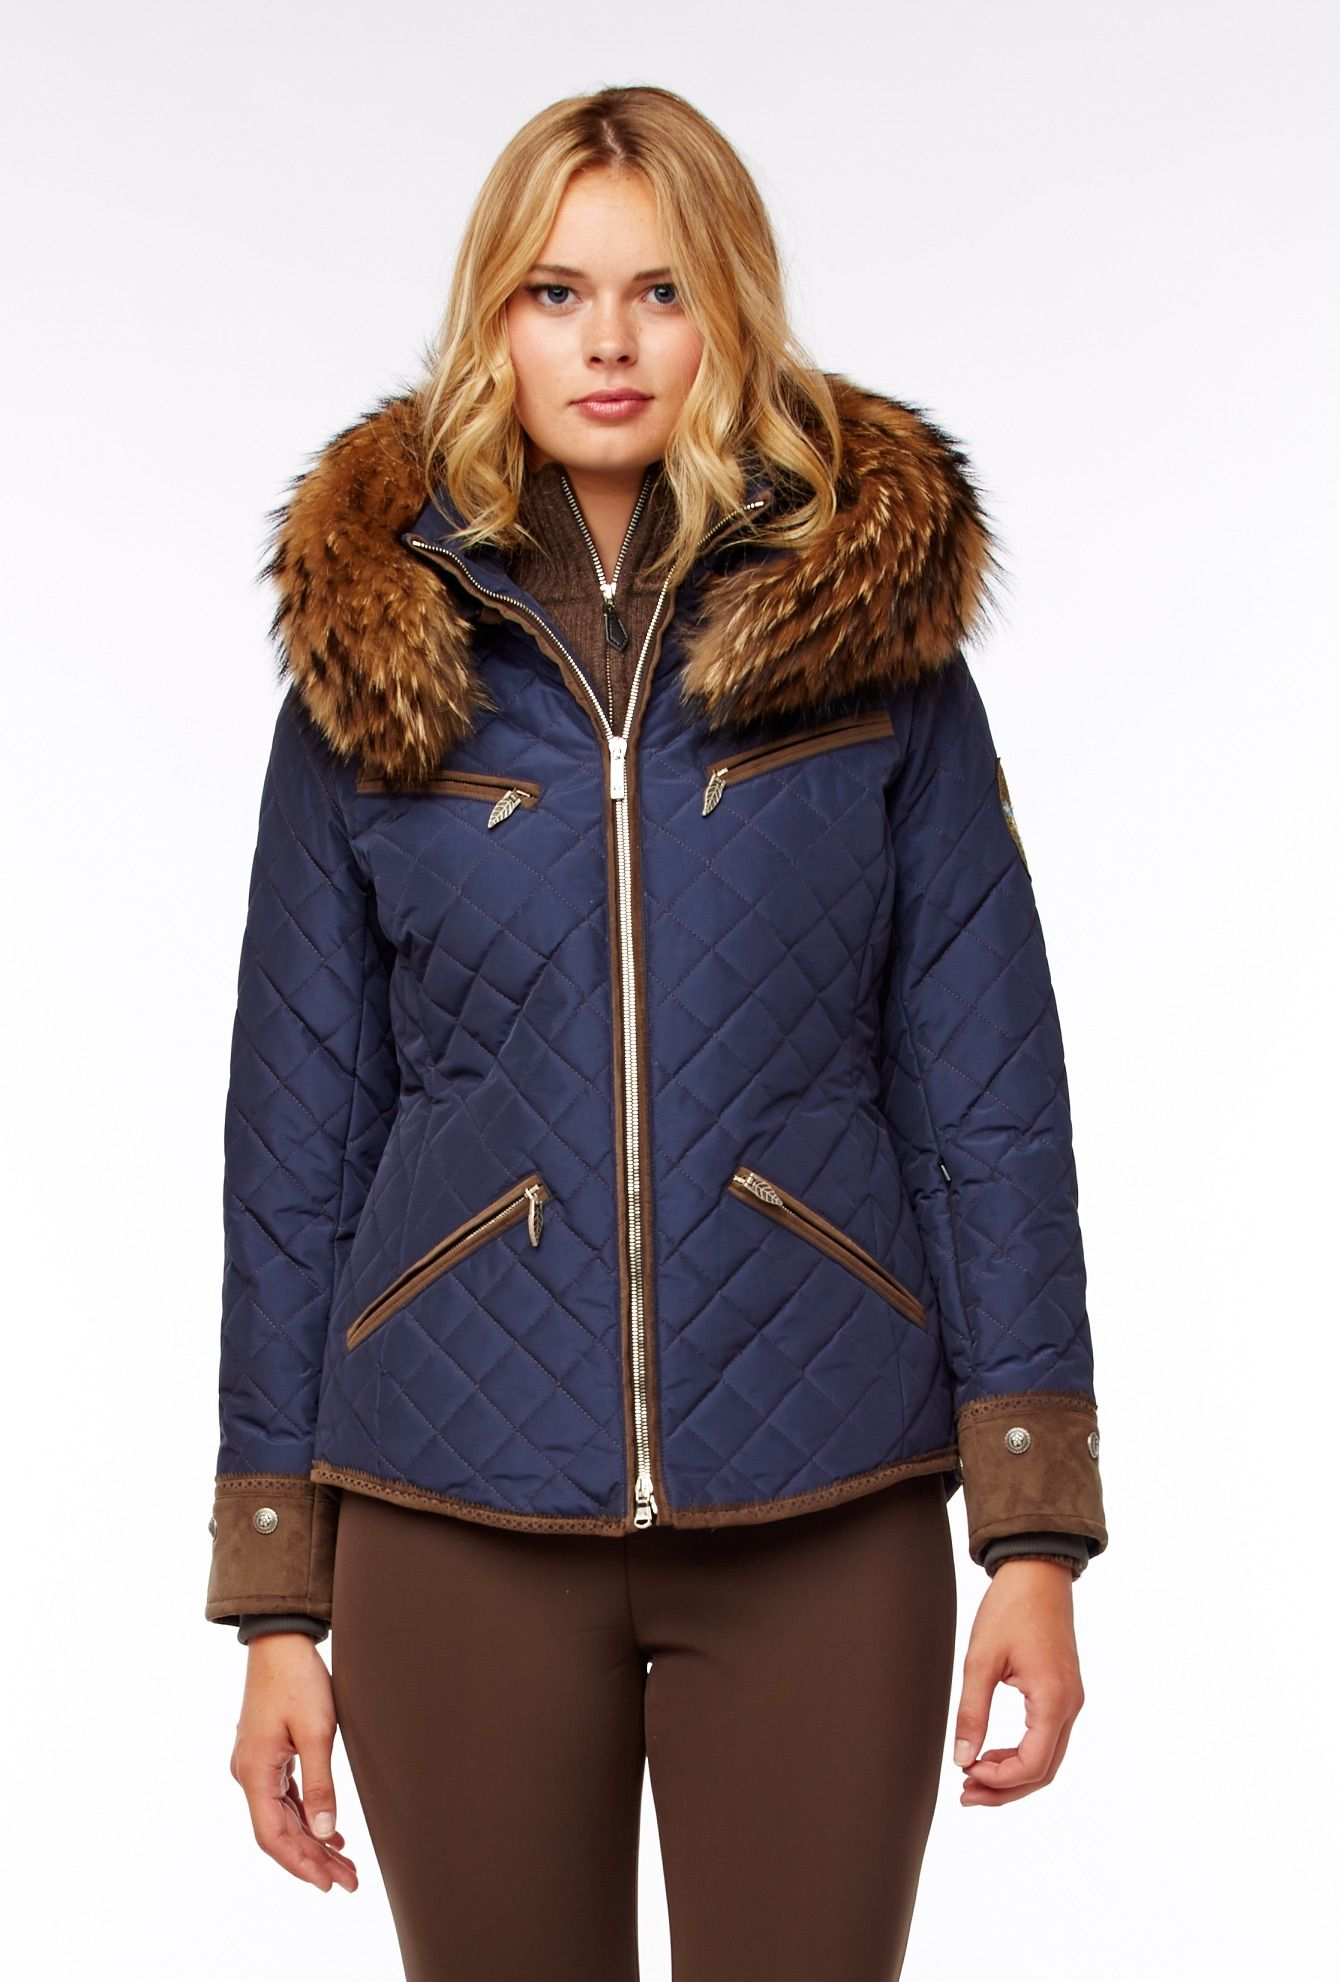 M Miller Ski Wear Winter 2017 2018 New Collection Highlights Ski Wear Ski Jacket Women Fur Hood Jacket